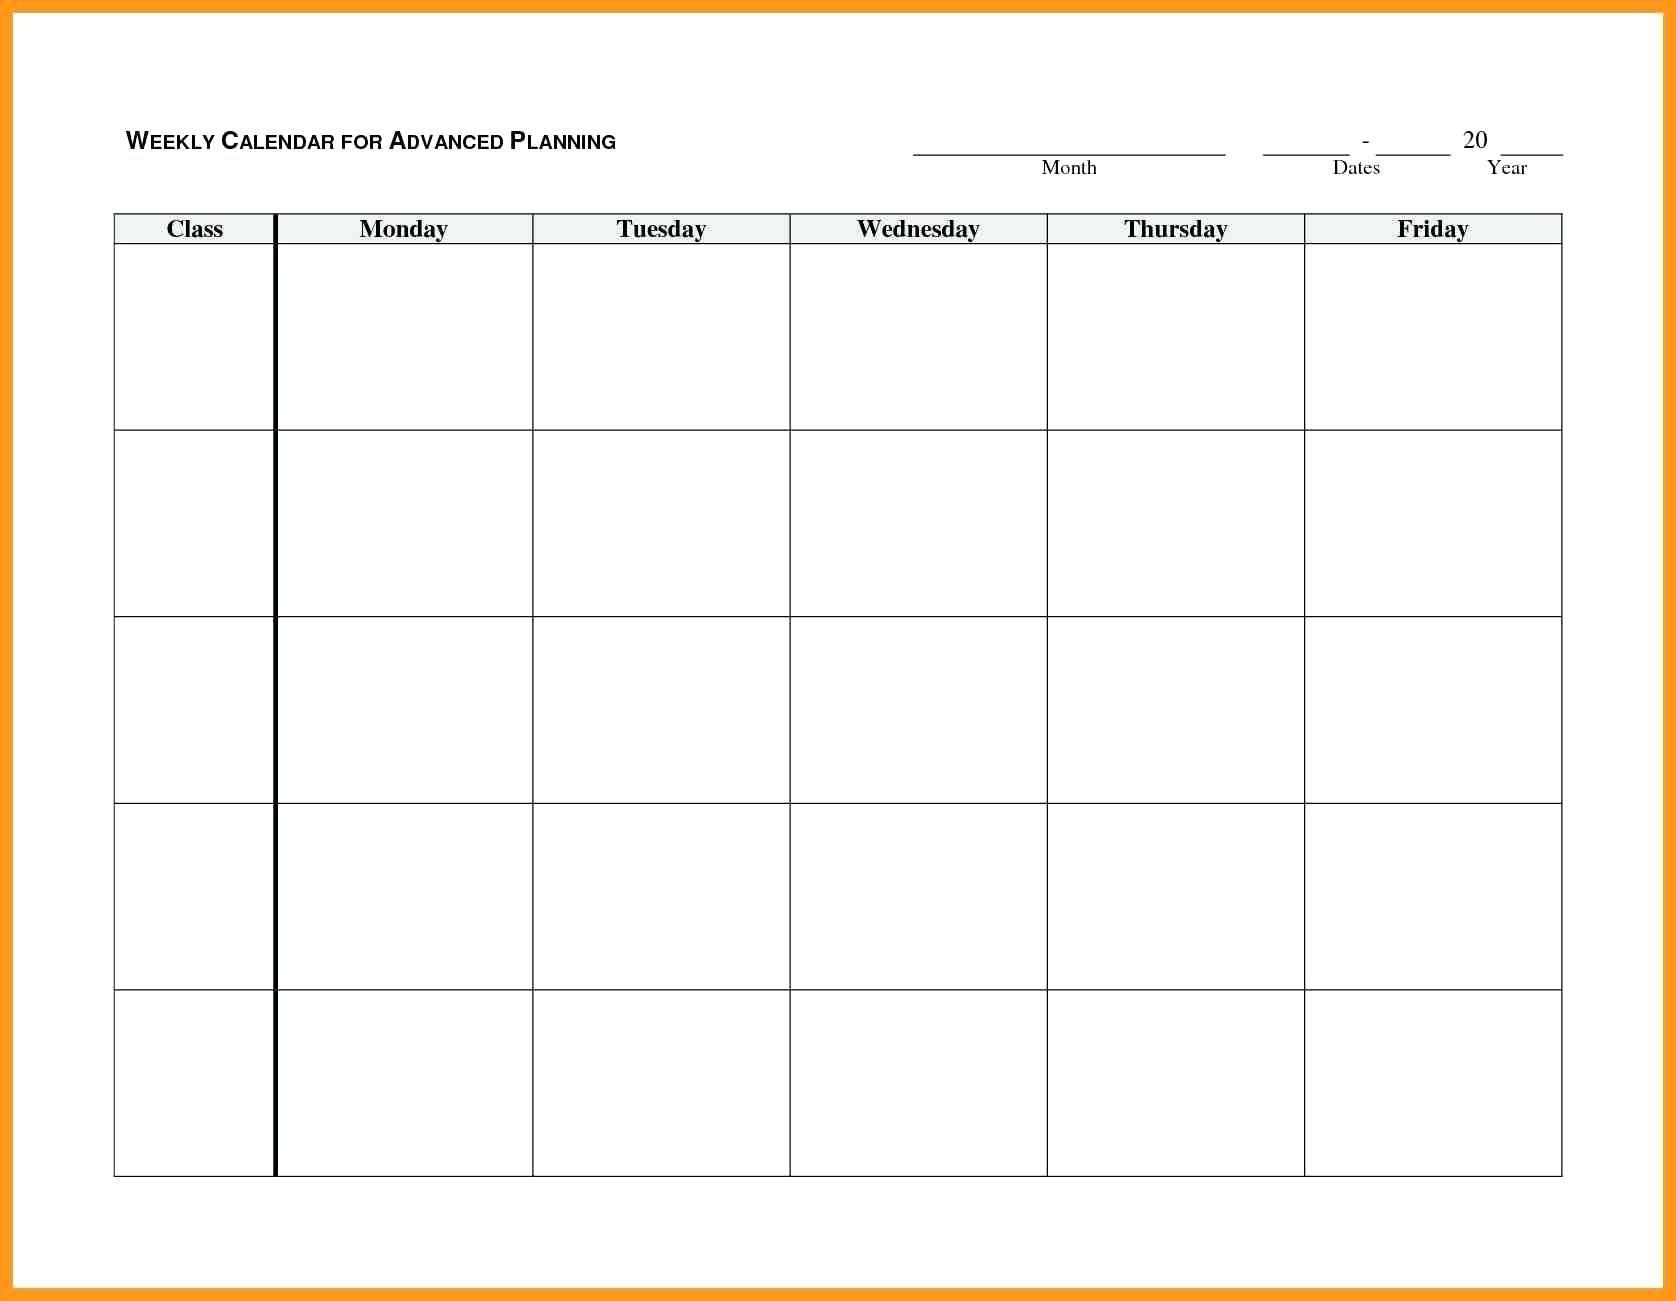 Calendar Monday To Friday - Bance